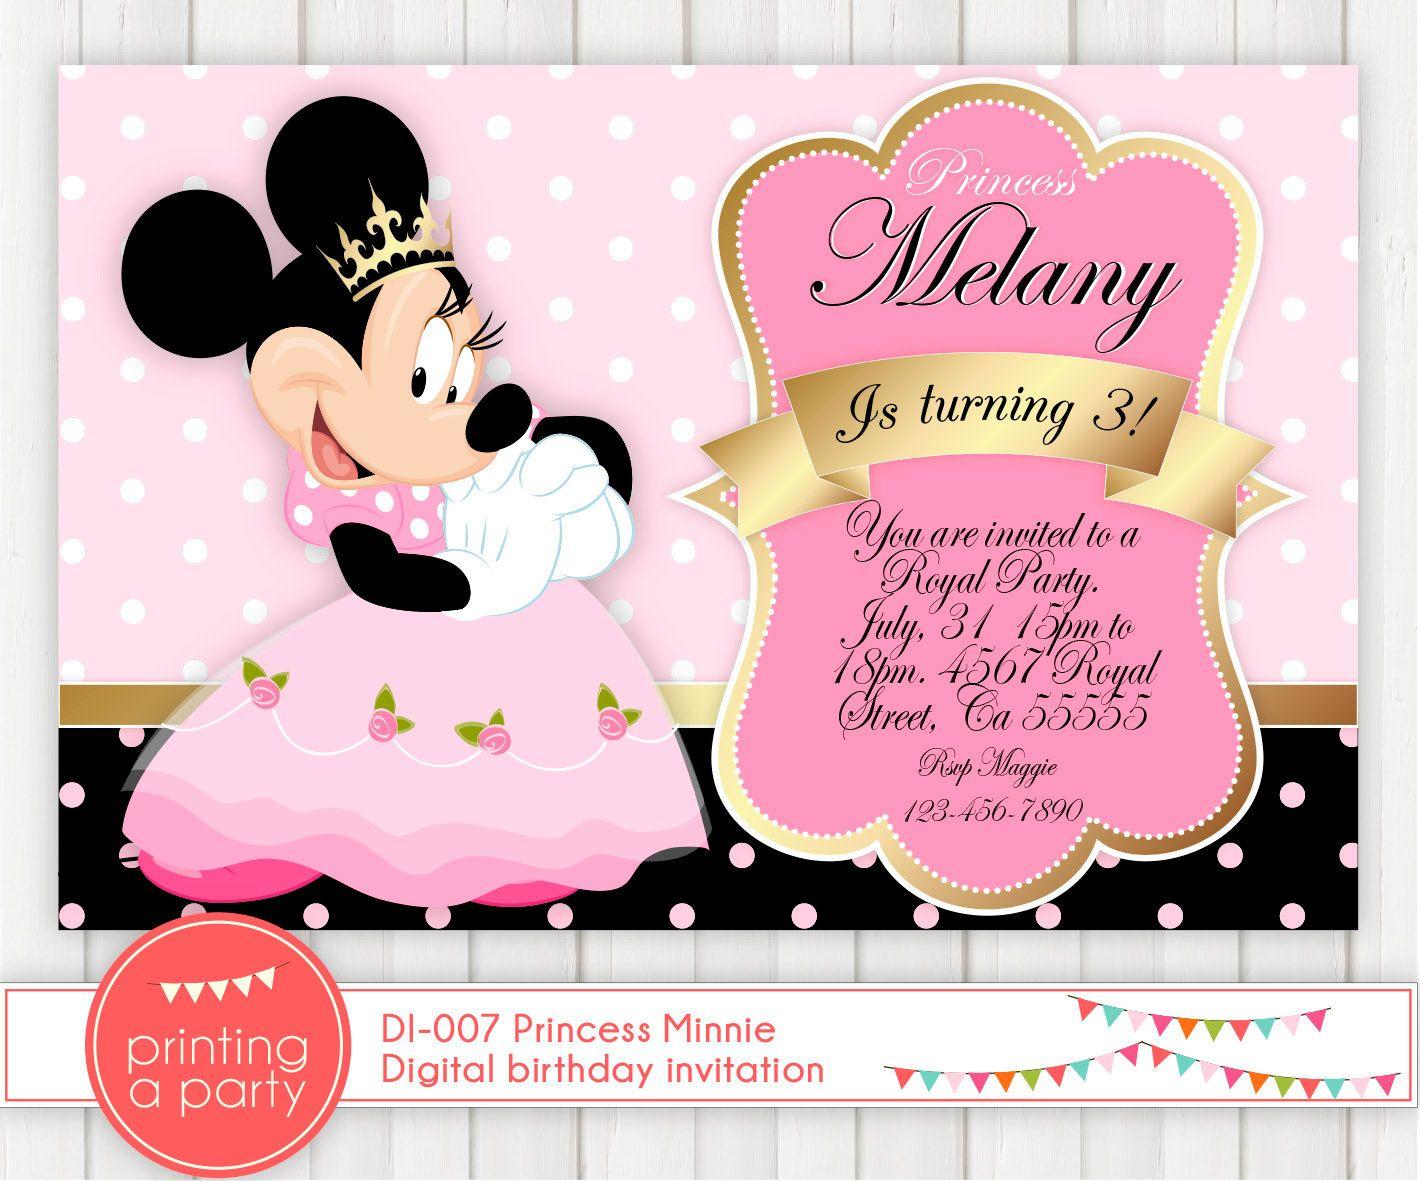 Minnie mouse invitation royal party princess by - Princesse minnie ...